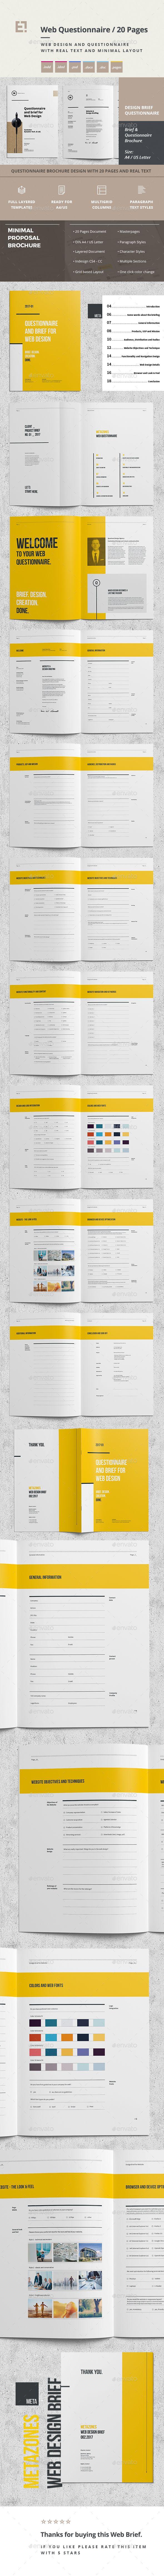 10 best Broszura - szablony images on Pinterest | Brochure design ...